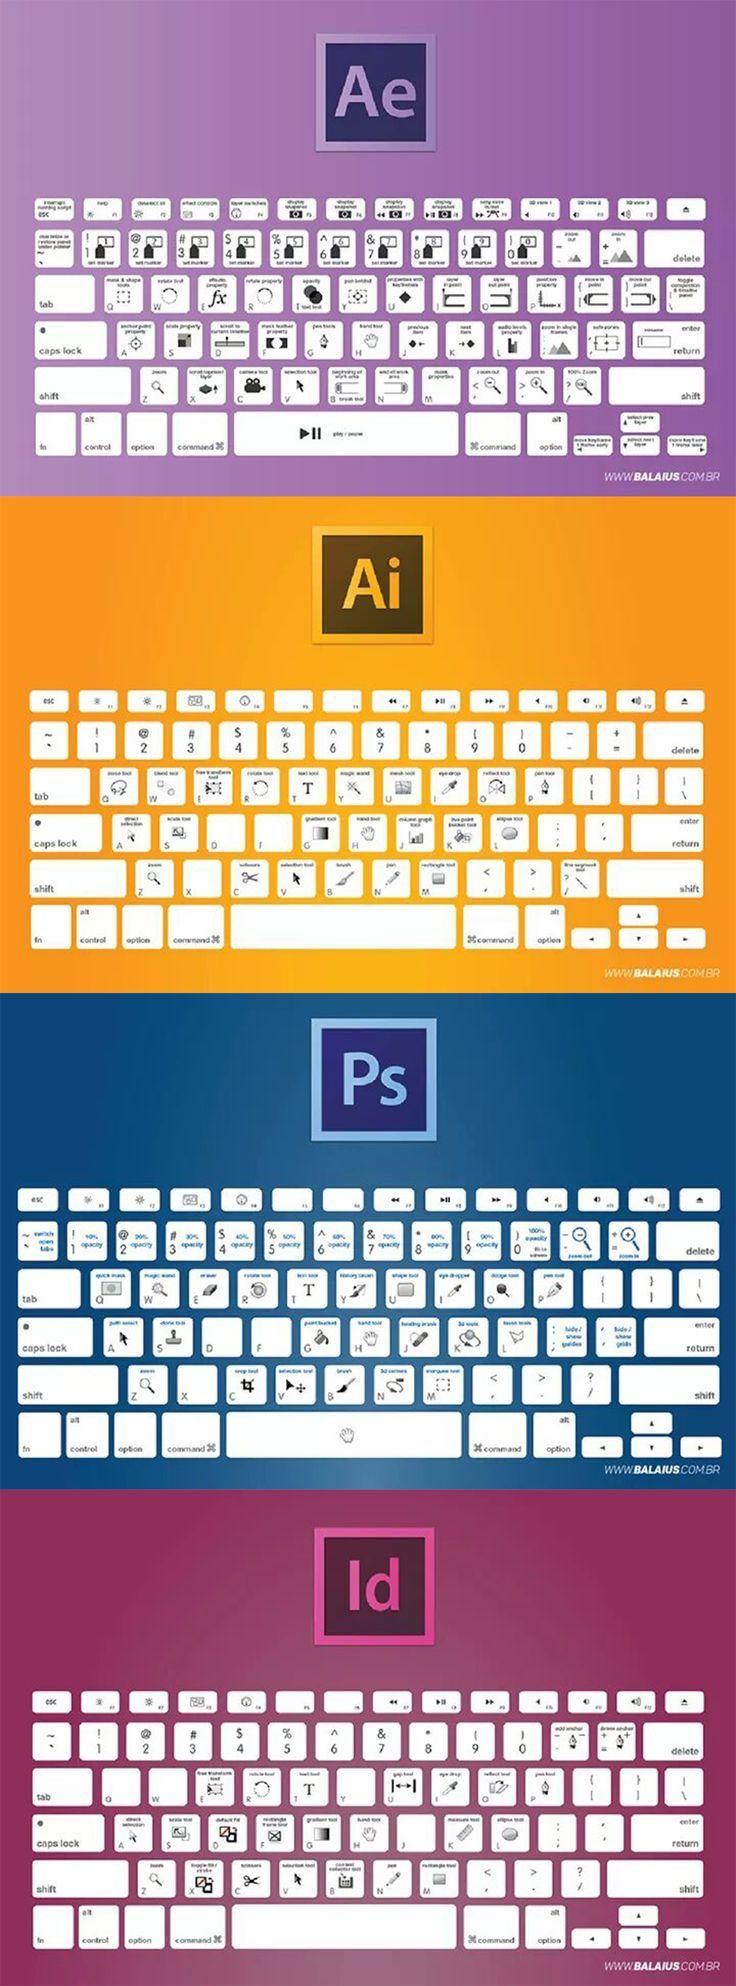 Arch Mohammed Al Dali On Twitter Photoshop Keyboard Photoshop Design Graphic Design Tutorials